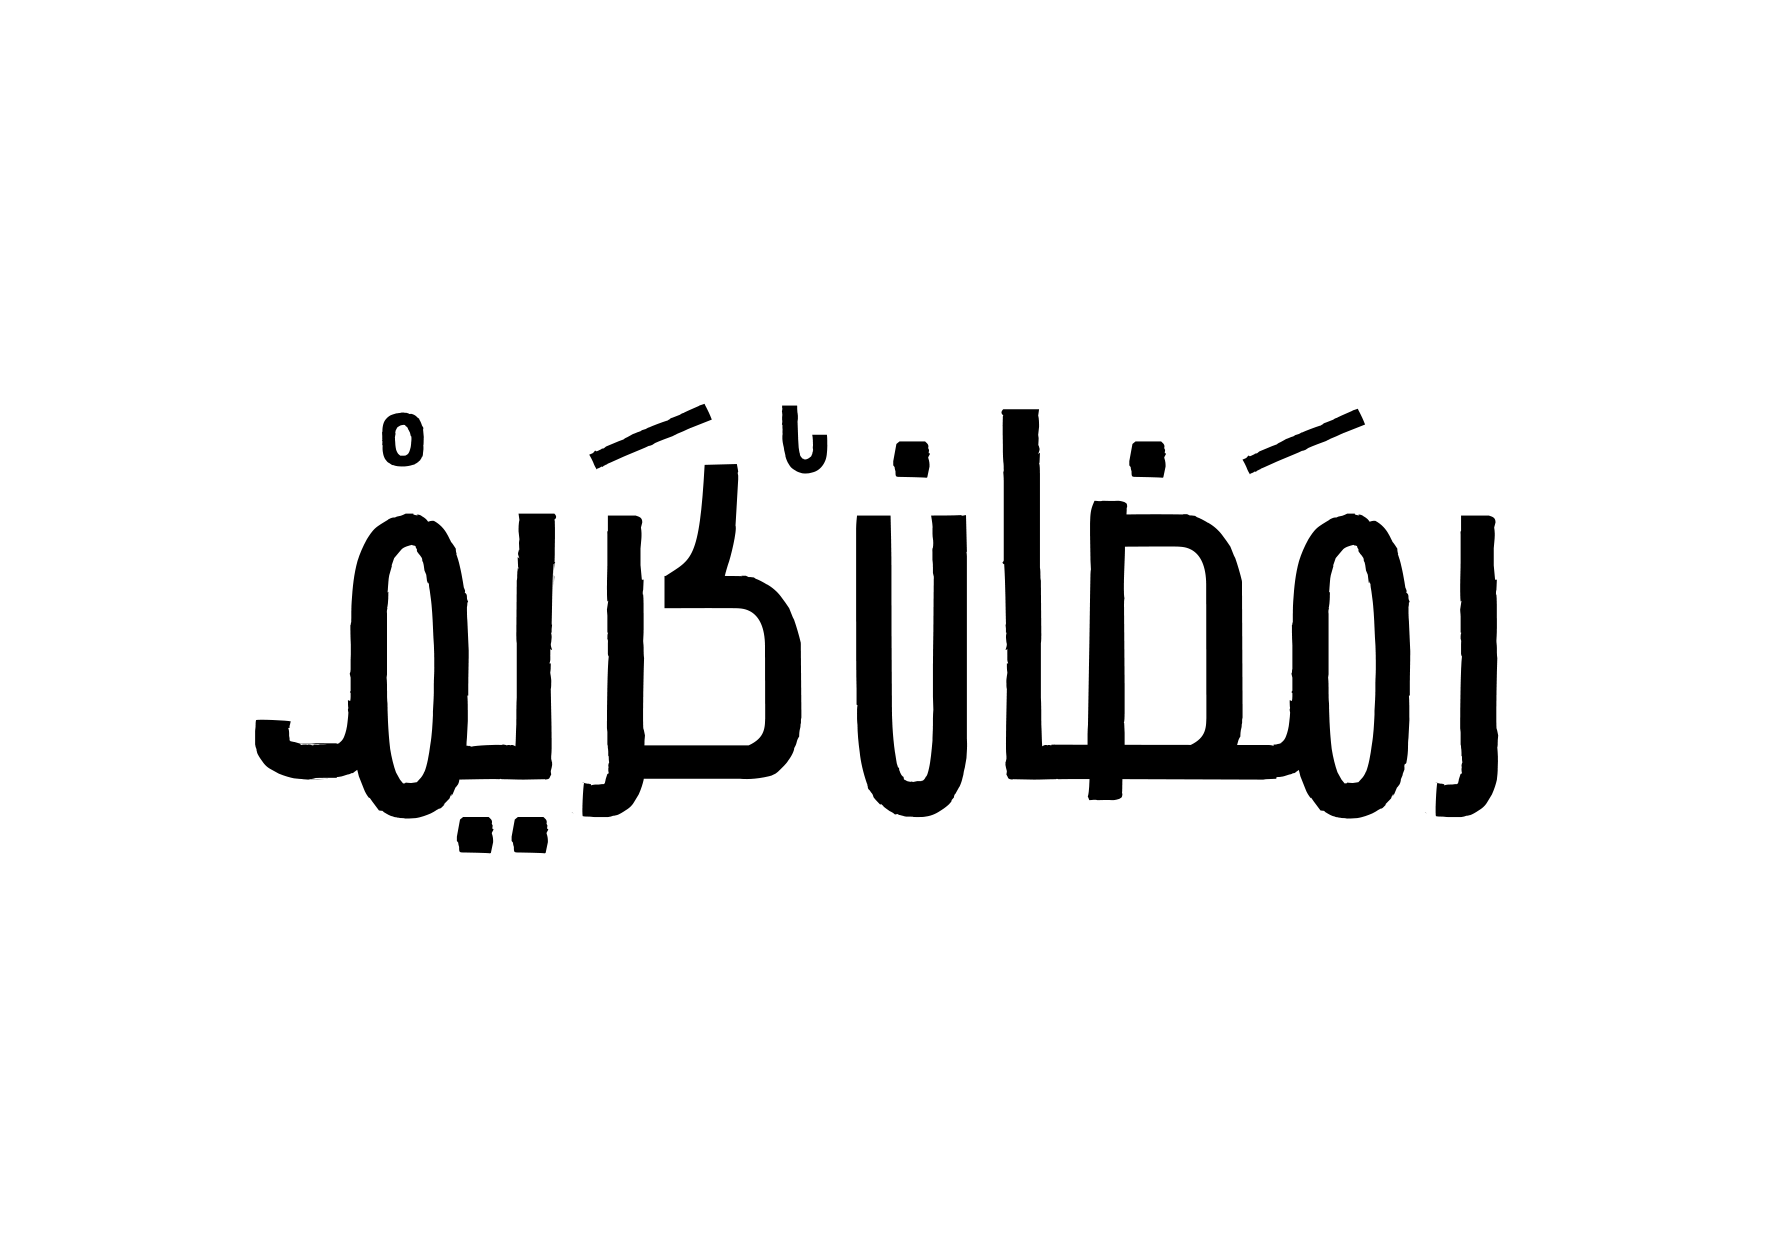 مخطوطه رمضان كريم مفرغه 5 15 مخطوطه لشهر رمضان بالخط الحر png